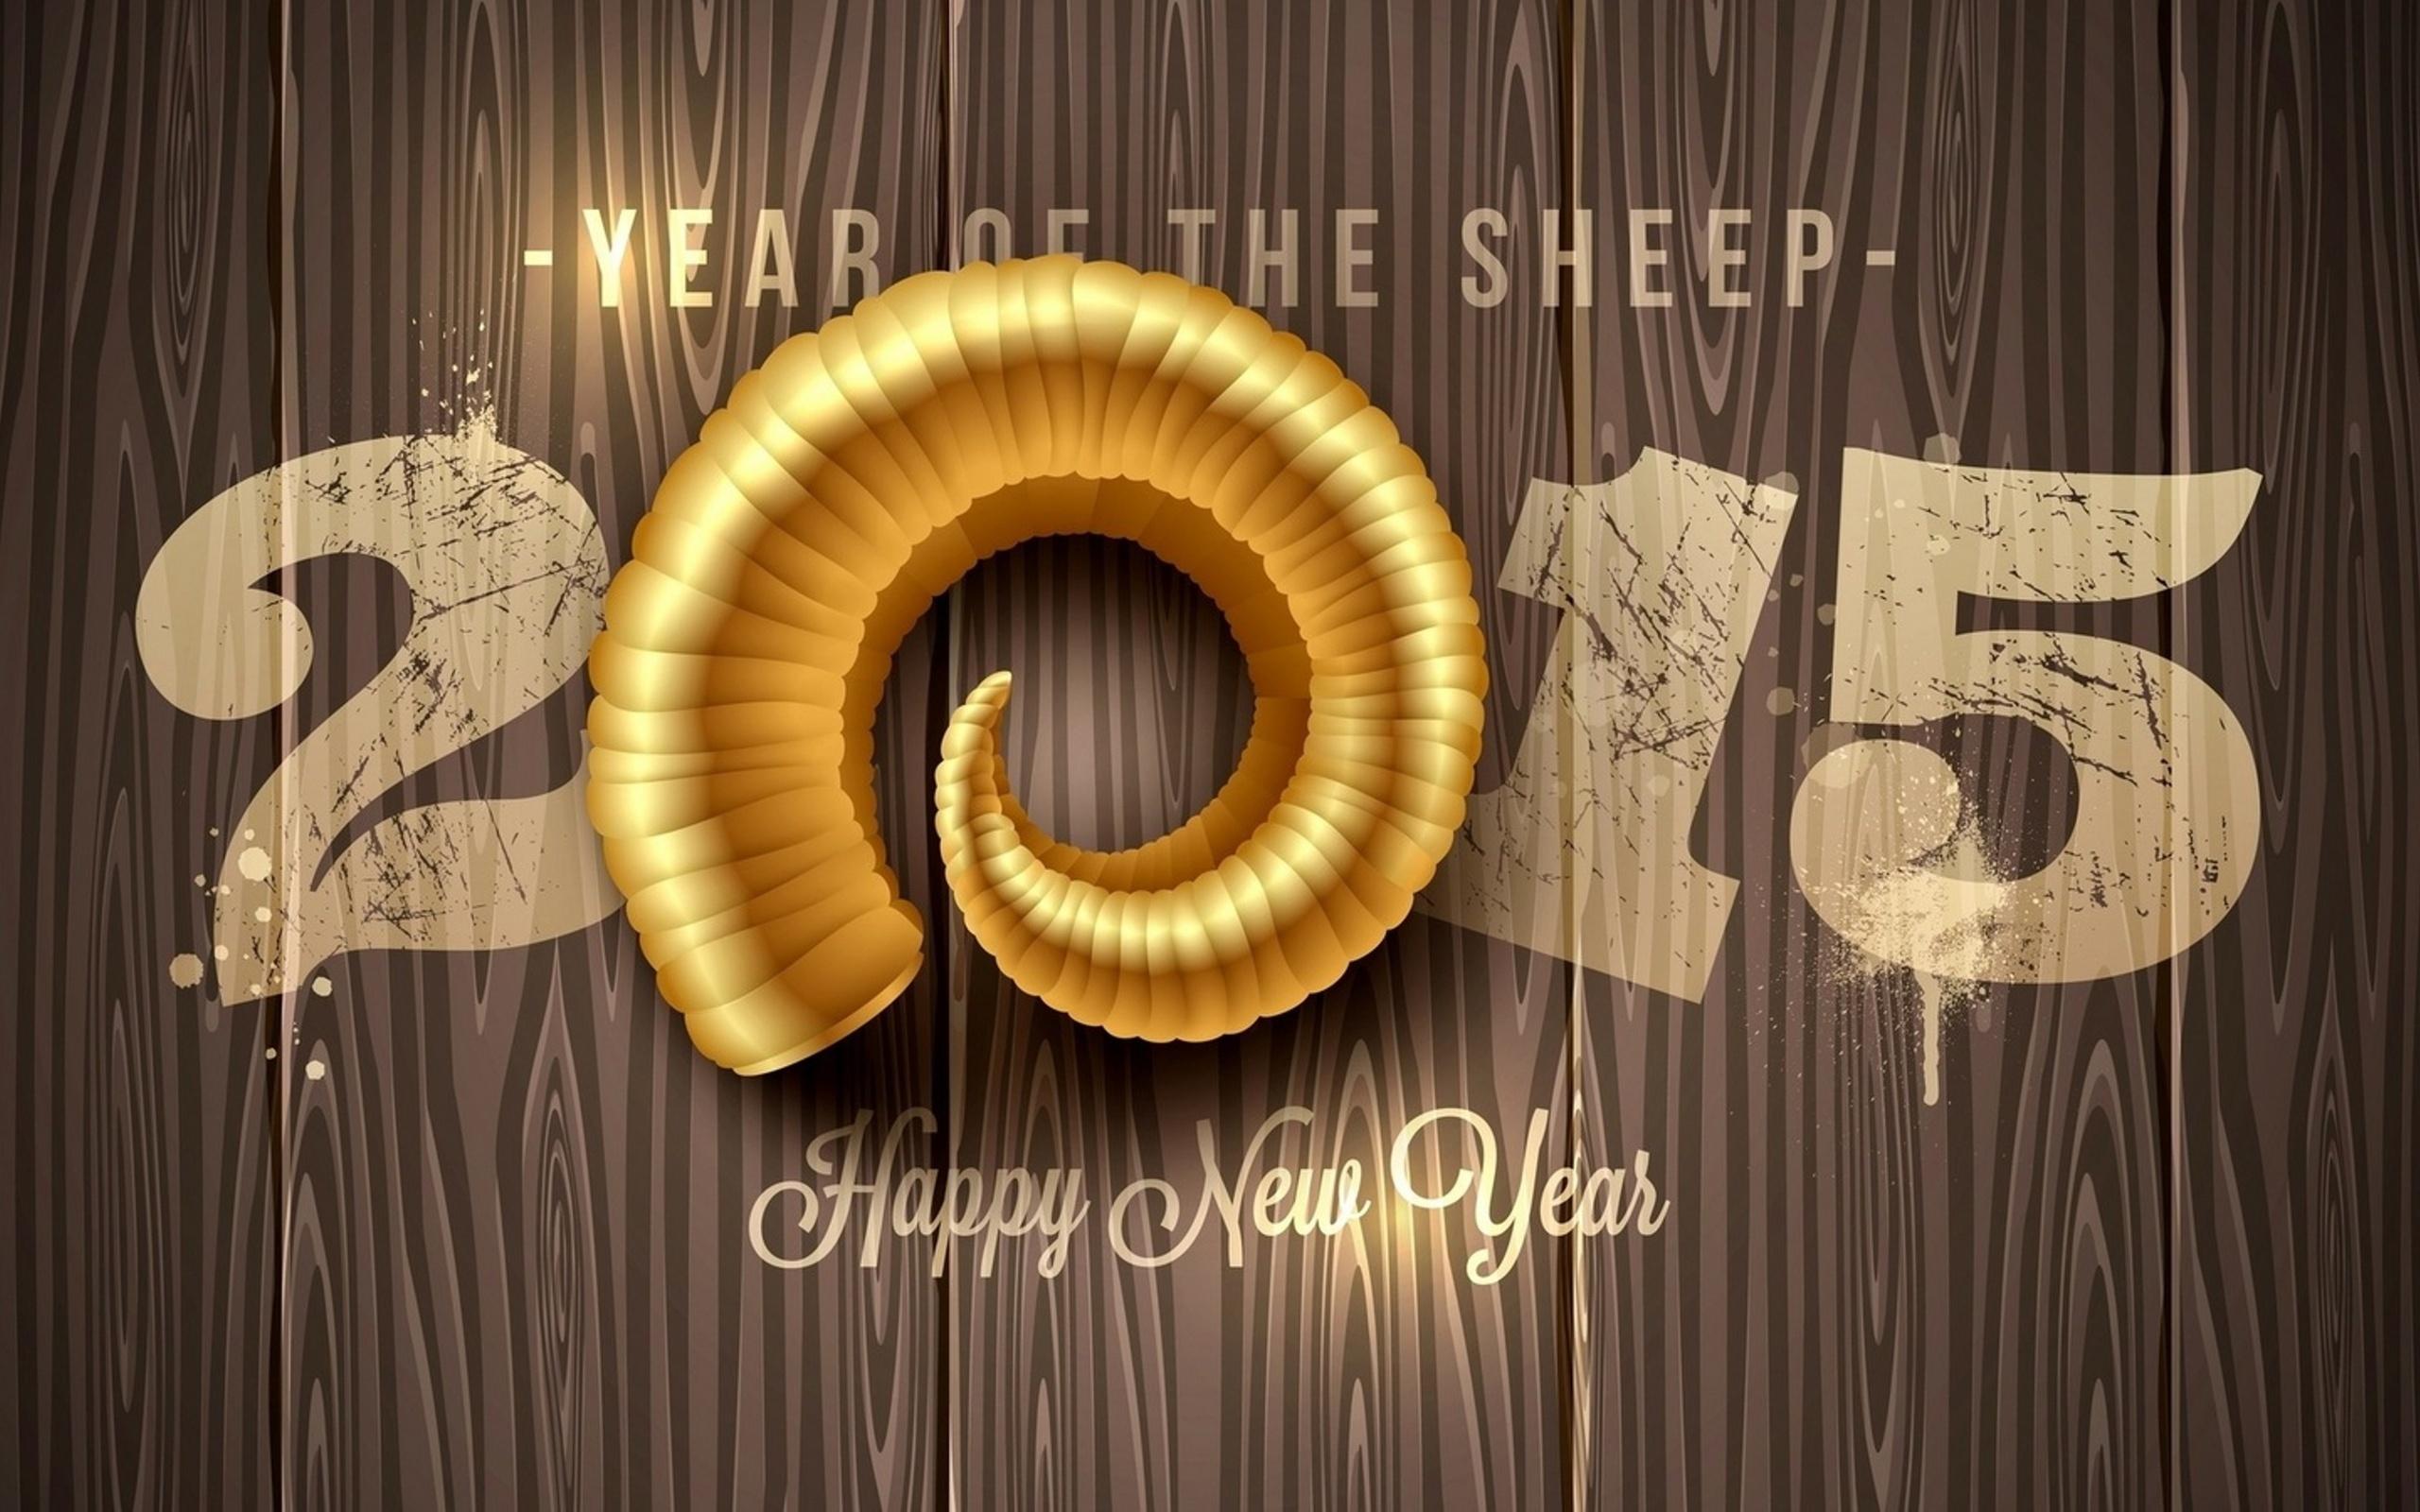 Мишка тебя, поздравление с 2014 картинки